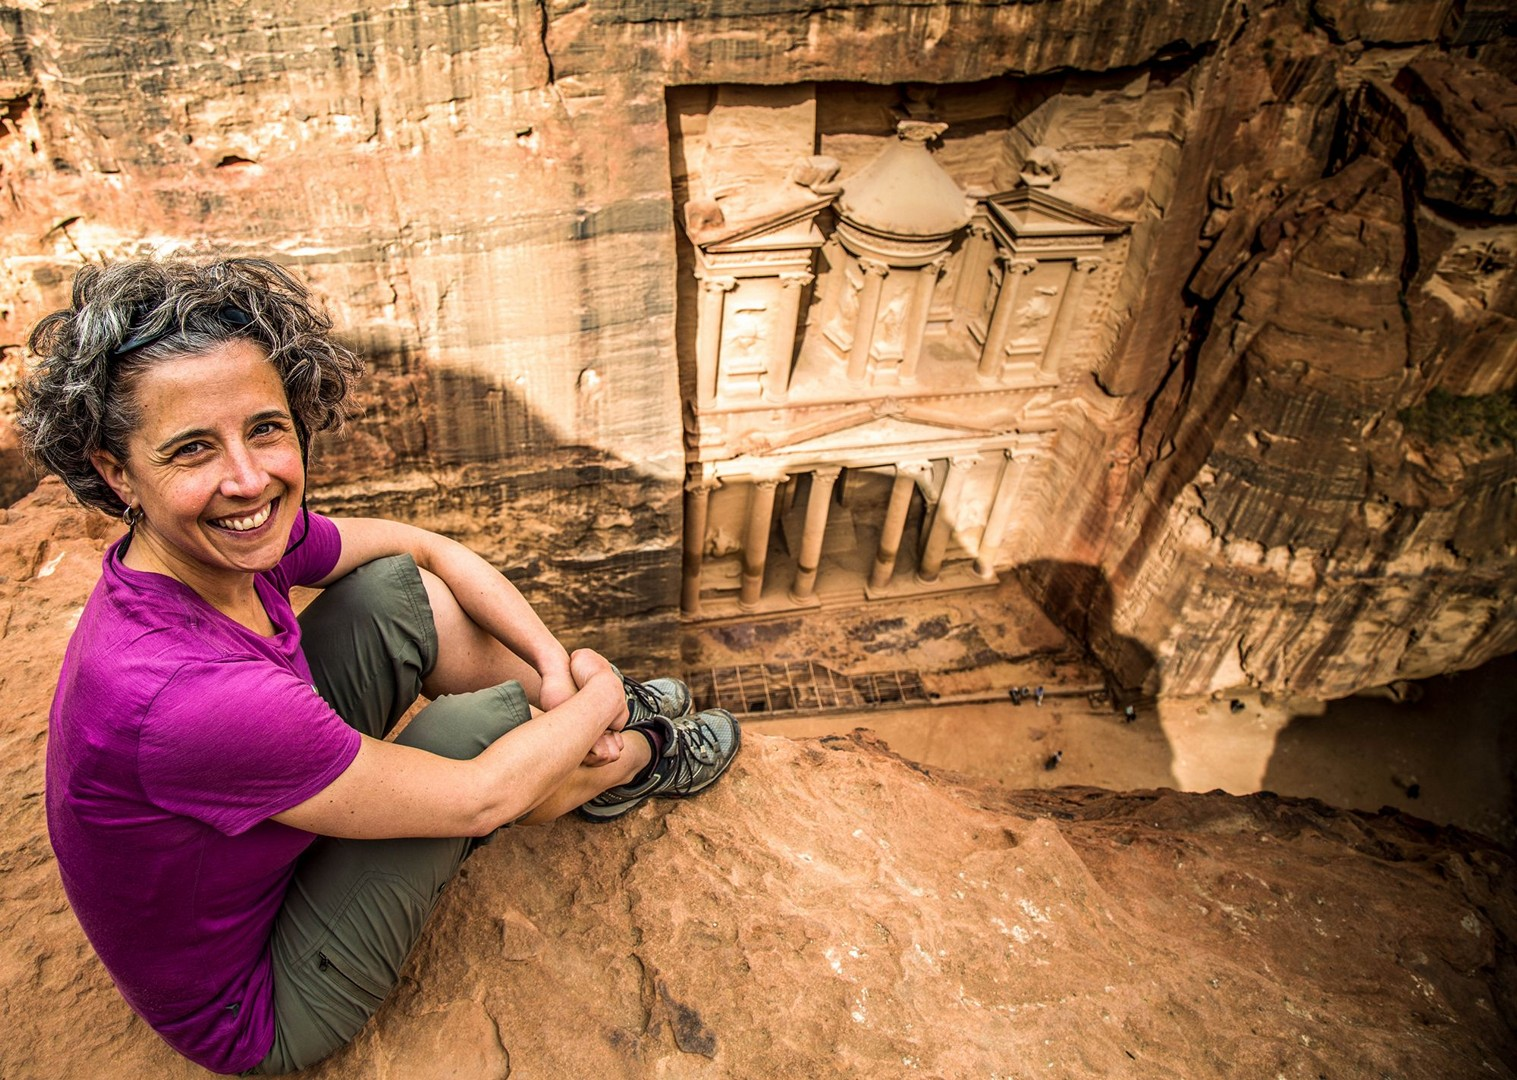 jordan-jebel-khubtha-cycling-holiday-adventure.jpg - NEW! Jordan - Petra, Wadi Rum & the Dead Sea - Cycling Adventures